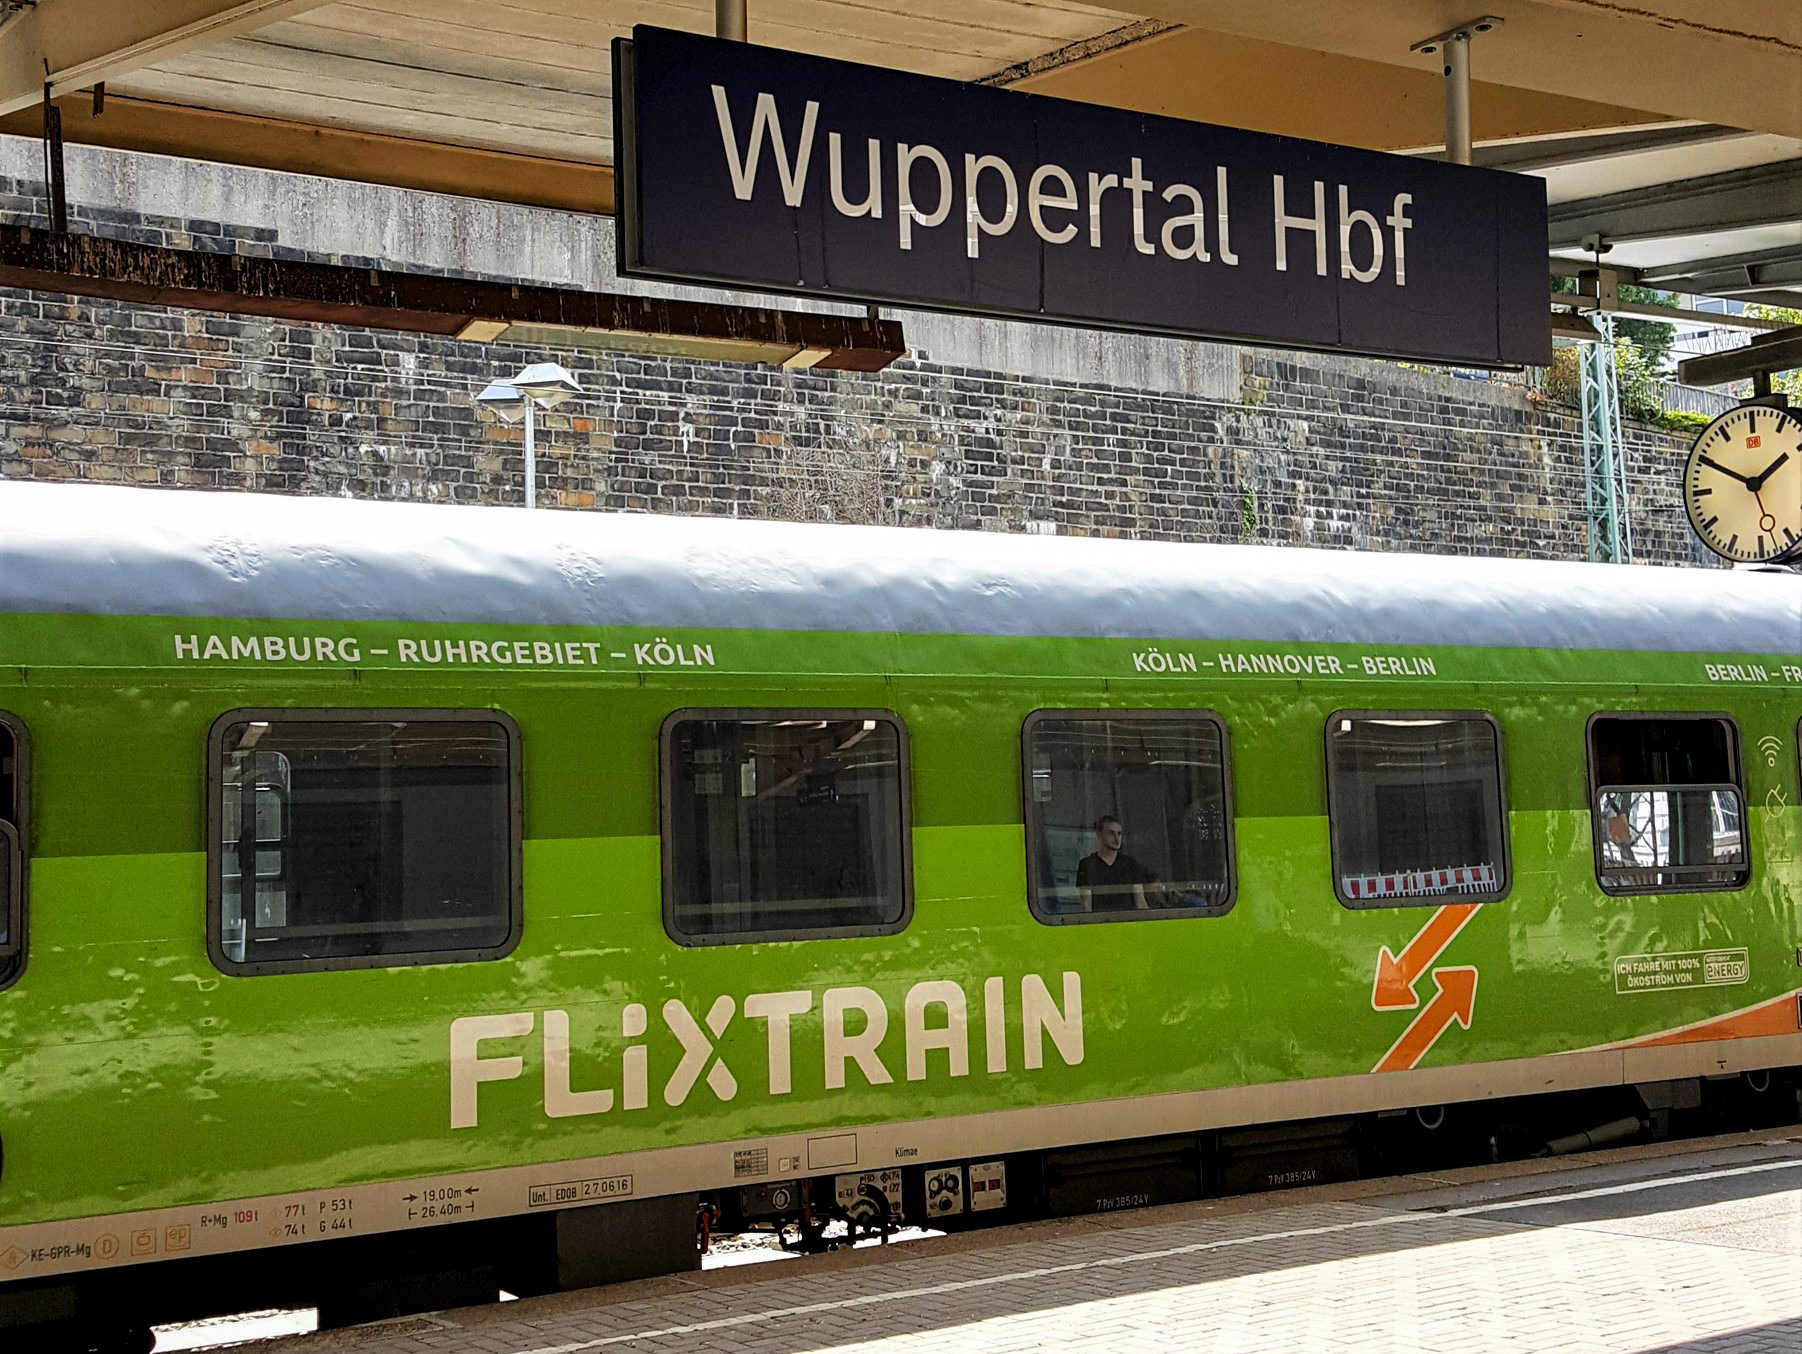 Sehnsuchtsort Wuppertal; Foto: Heidi Diehl